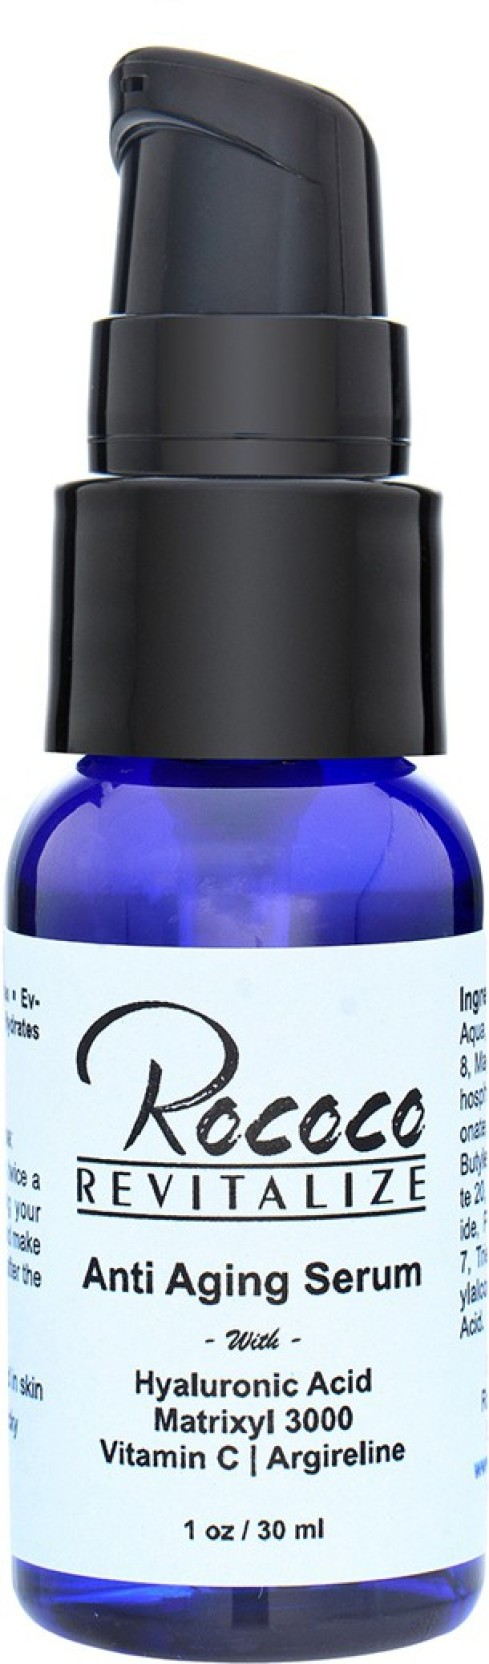 Rococo Anti Aging Serum Hyaluronic Acid Matrixyl 3000 Vitamin C